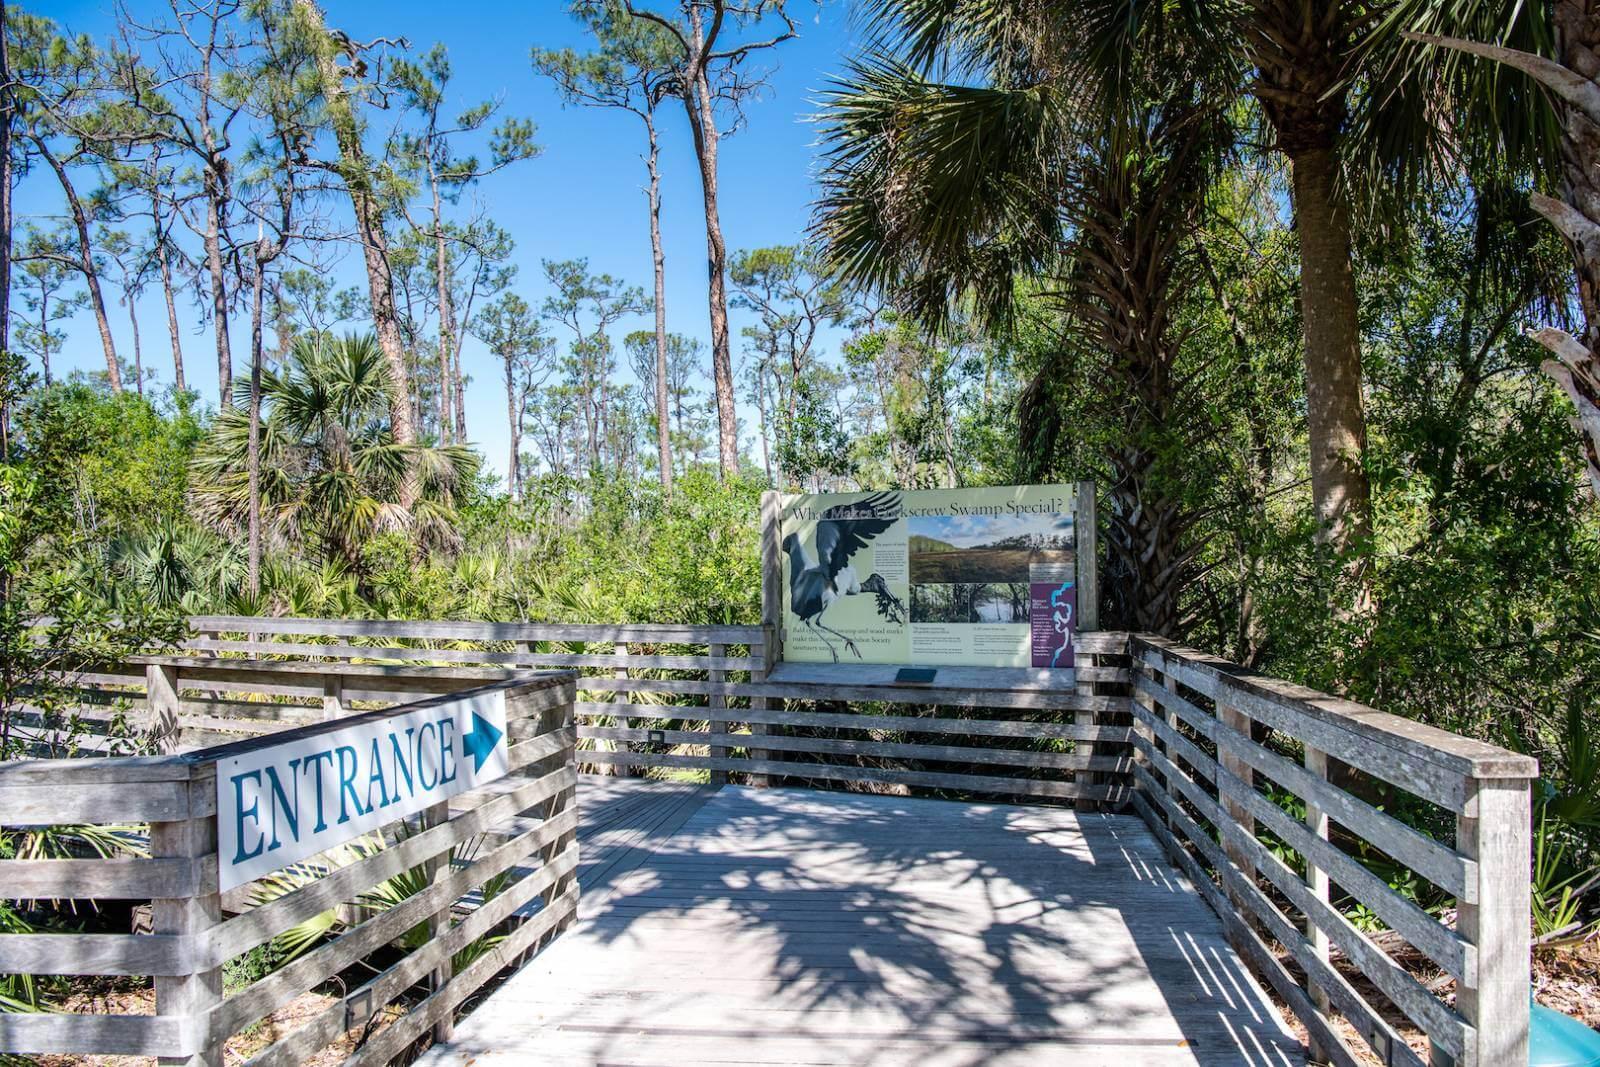 Boardwalk trail entrance Corkscrew Swamp Sanctuary Naples, Florida. Photo by Jennifer Brinkman | Must Do Visitor Guides, MustDo.com